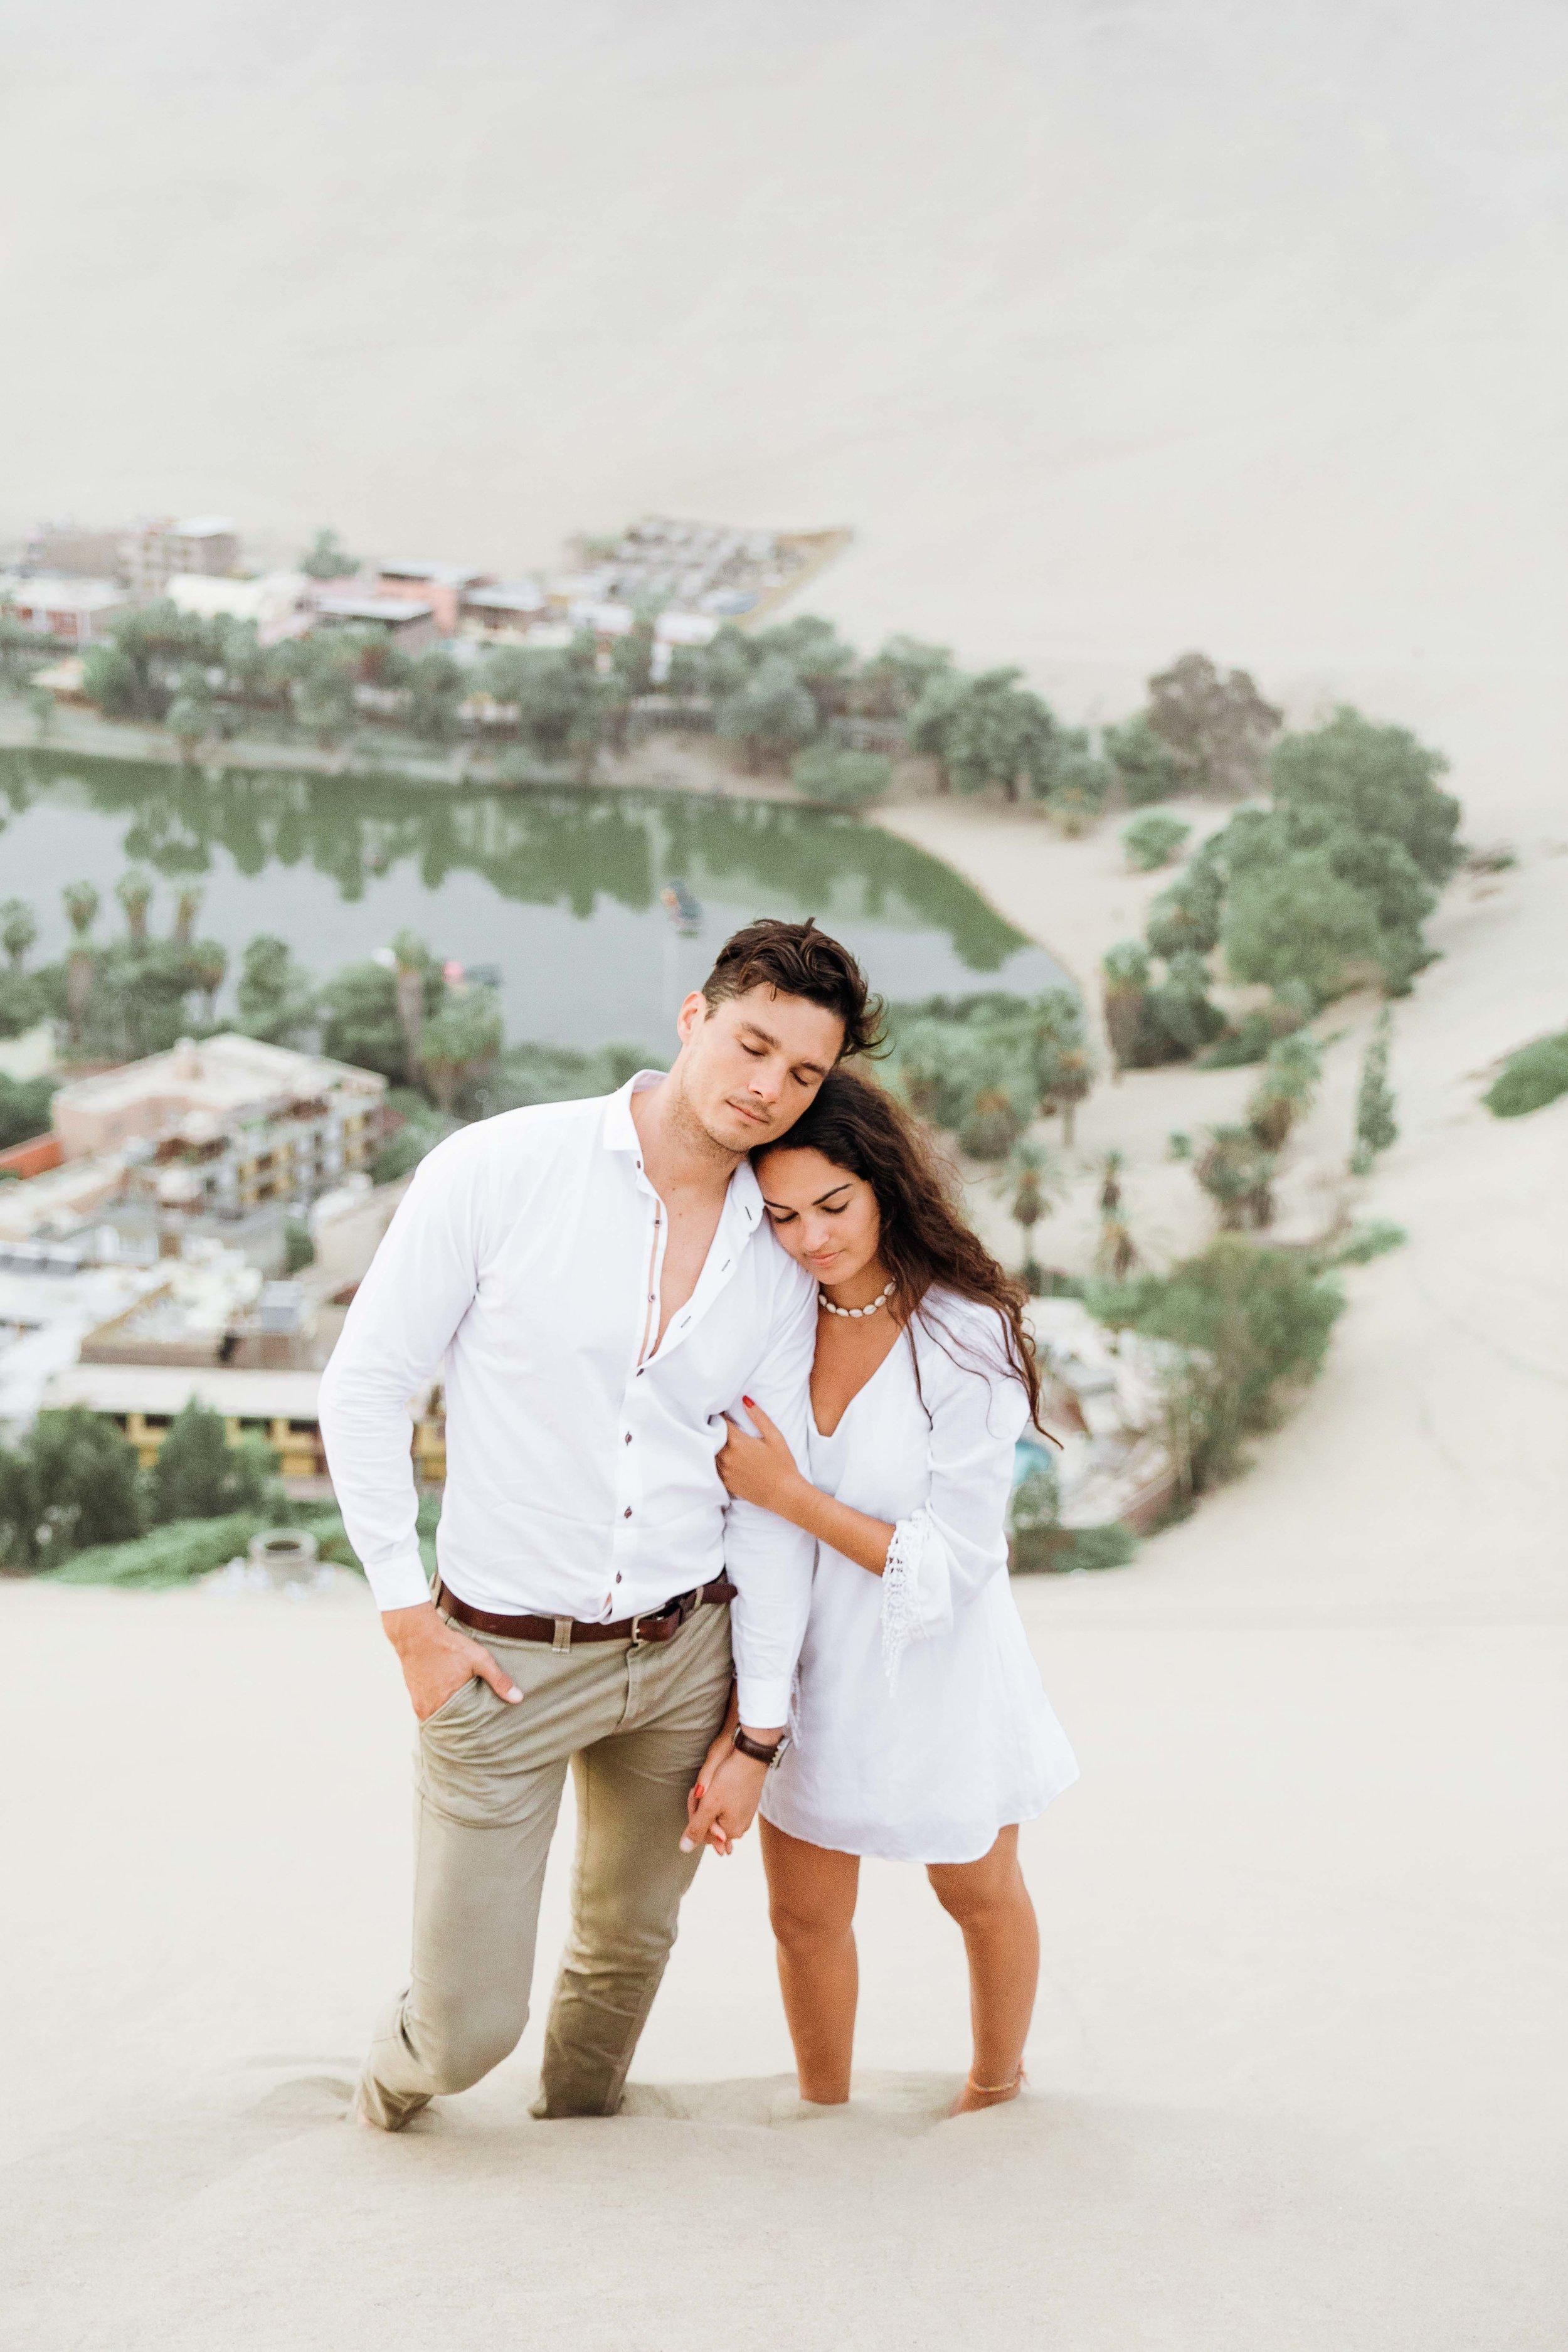 huacachina-peru-honeymoon-elopement-destination-wedding-photography-michael-cozzens-10.jpg